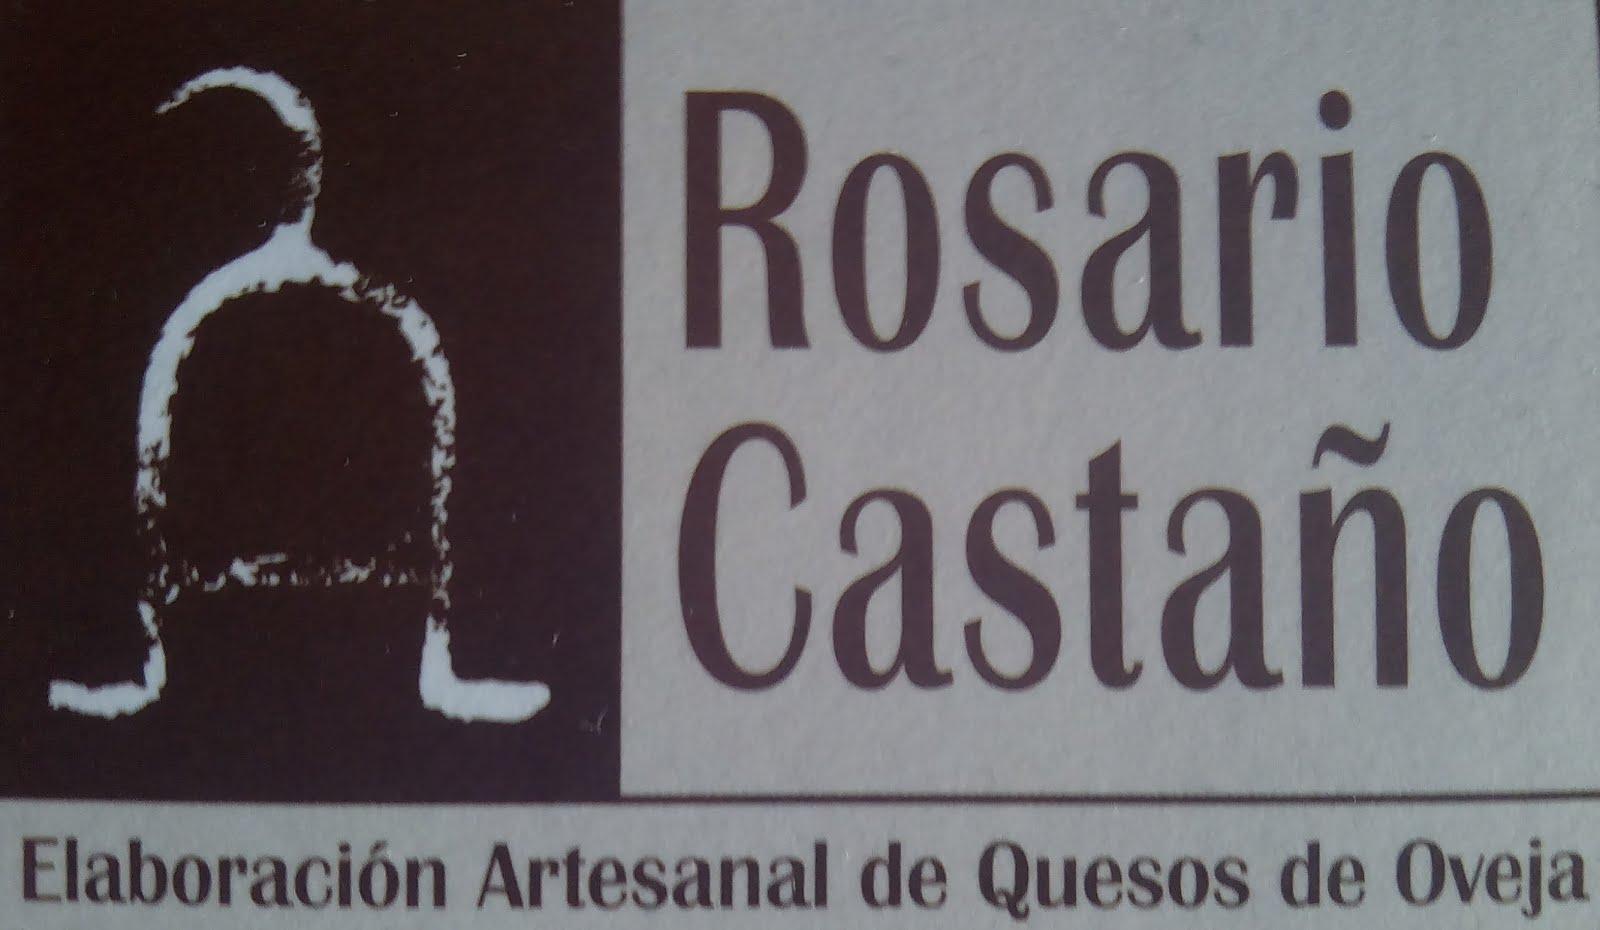 Quesos Rosario Castaño